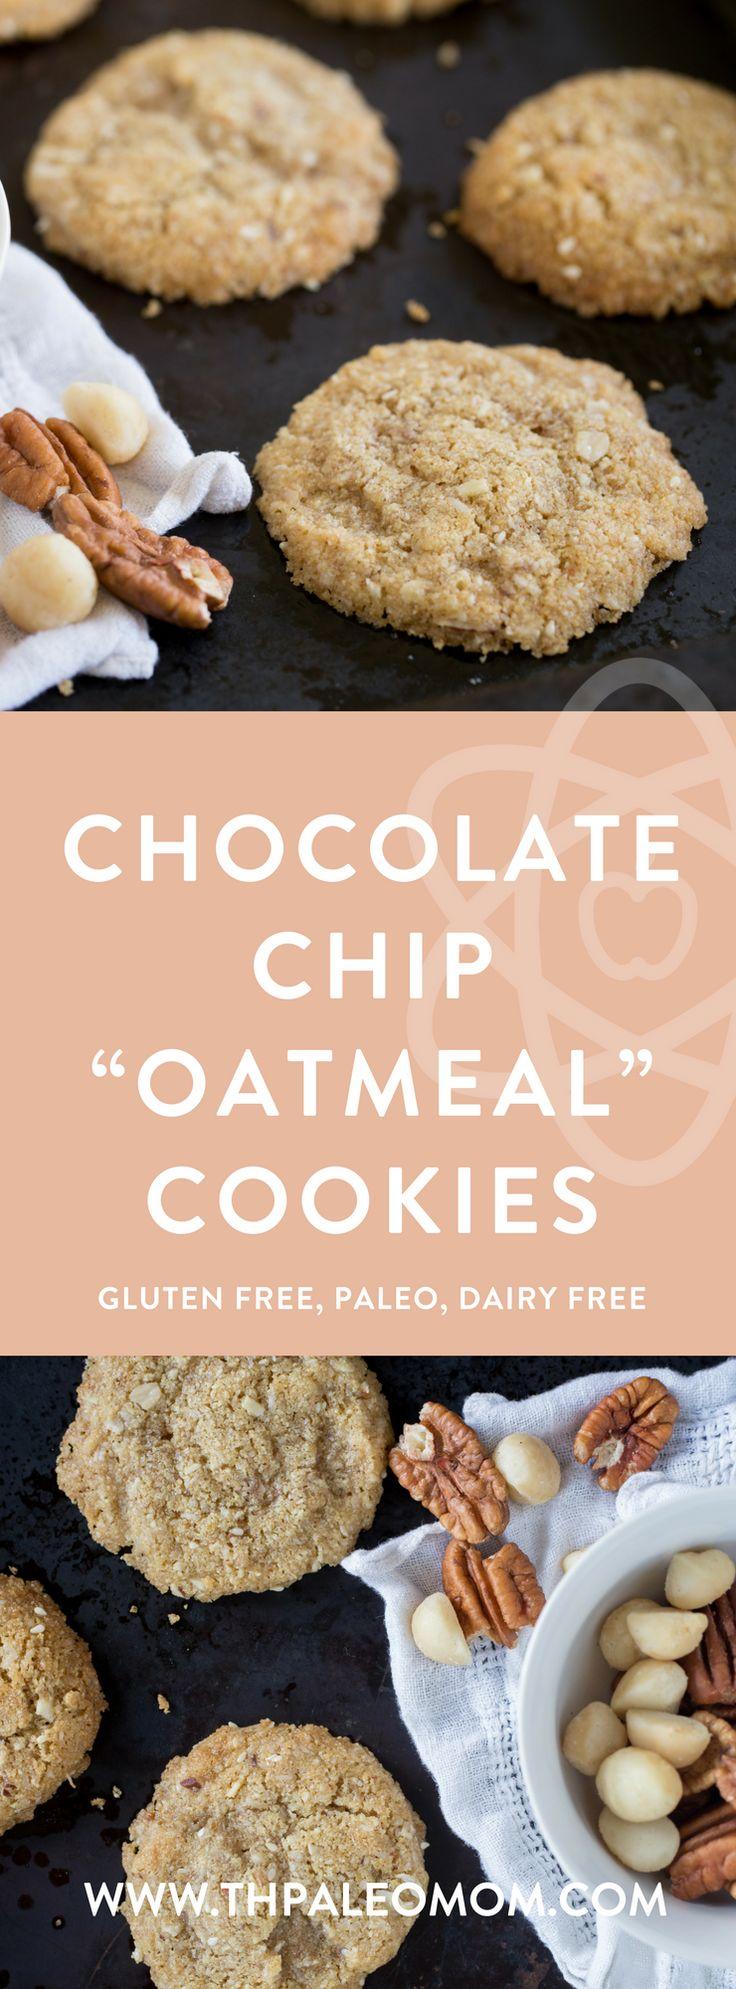 "Chocolate Chip ""Oatmeal"" Cookies   The Paleo Mom"